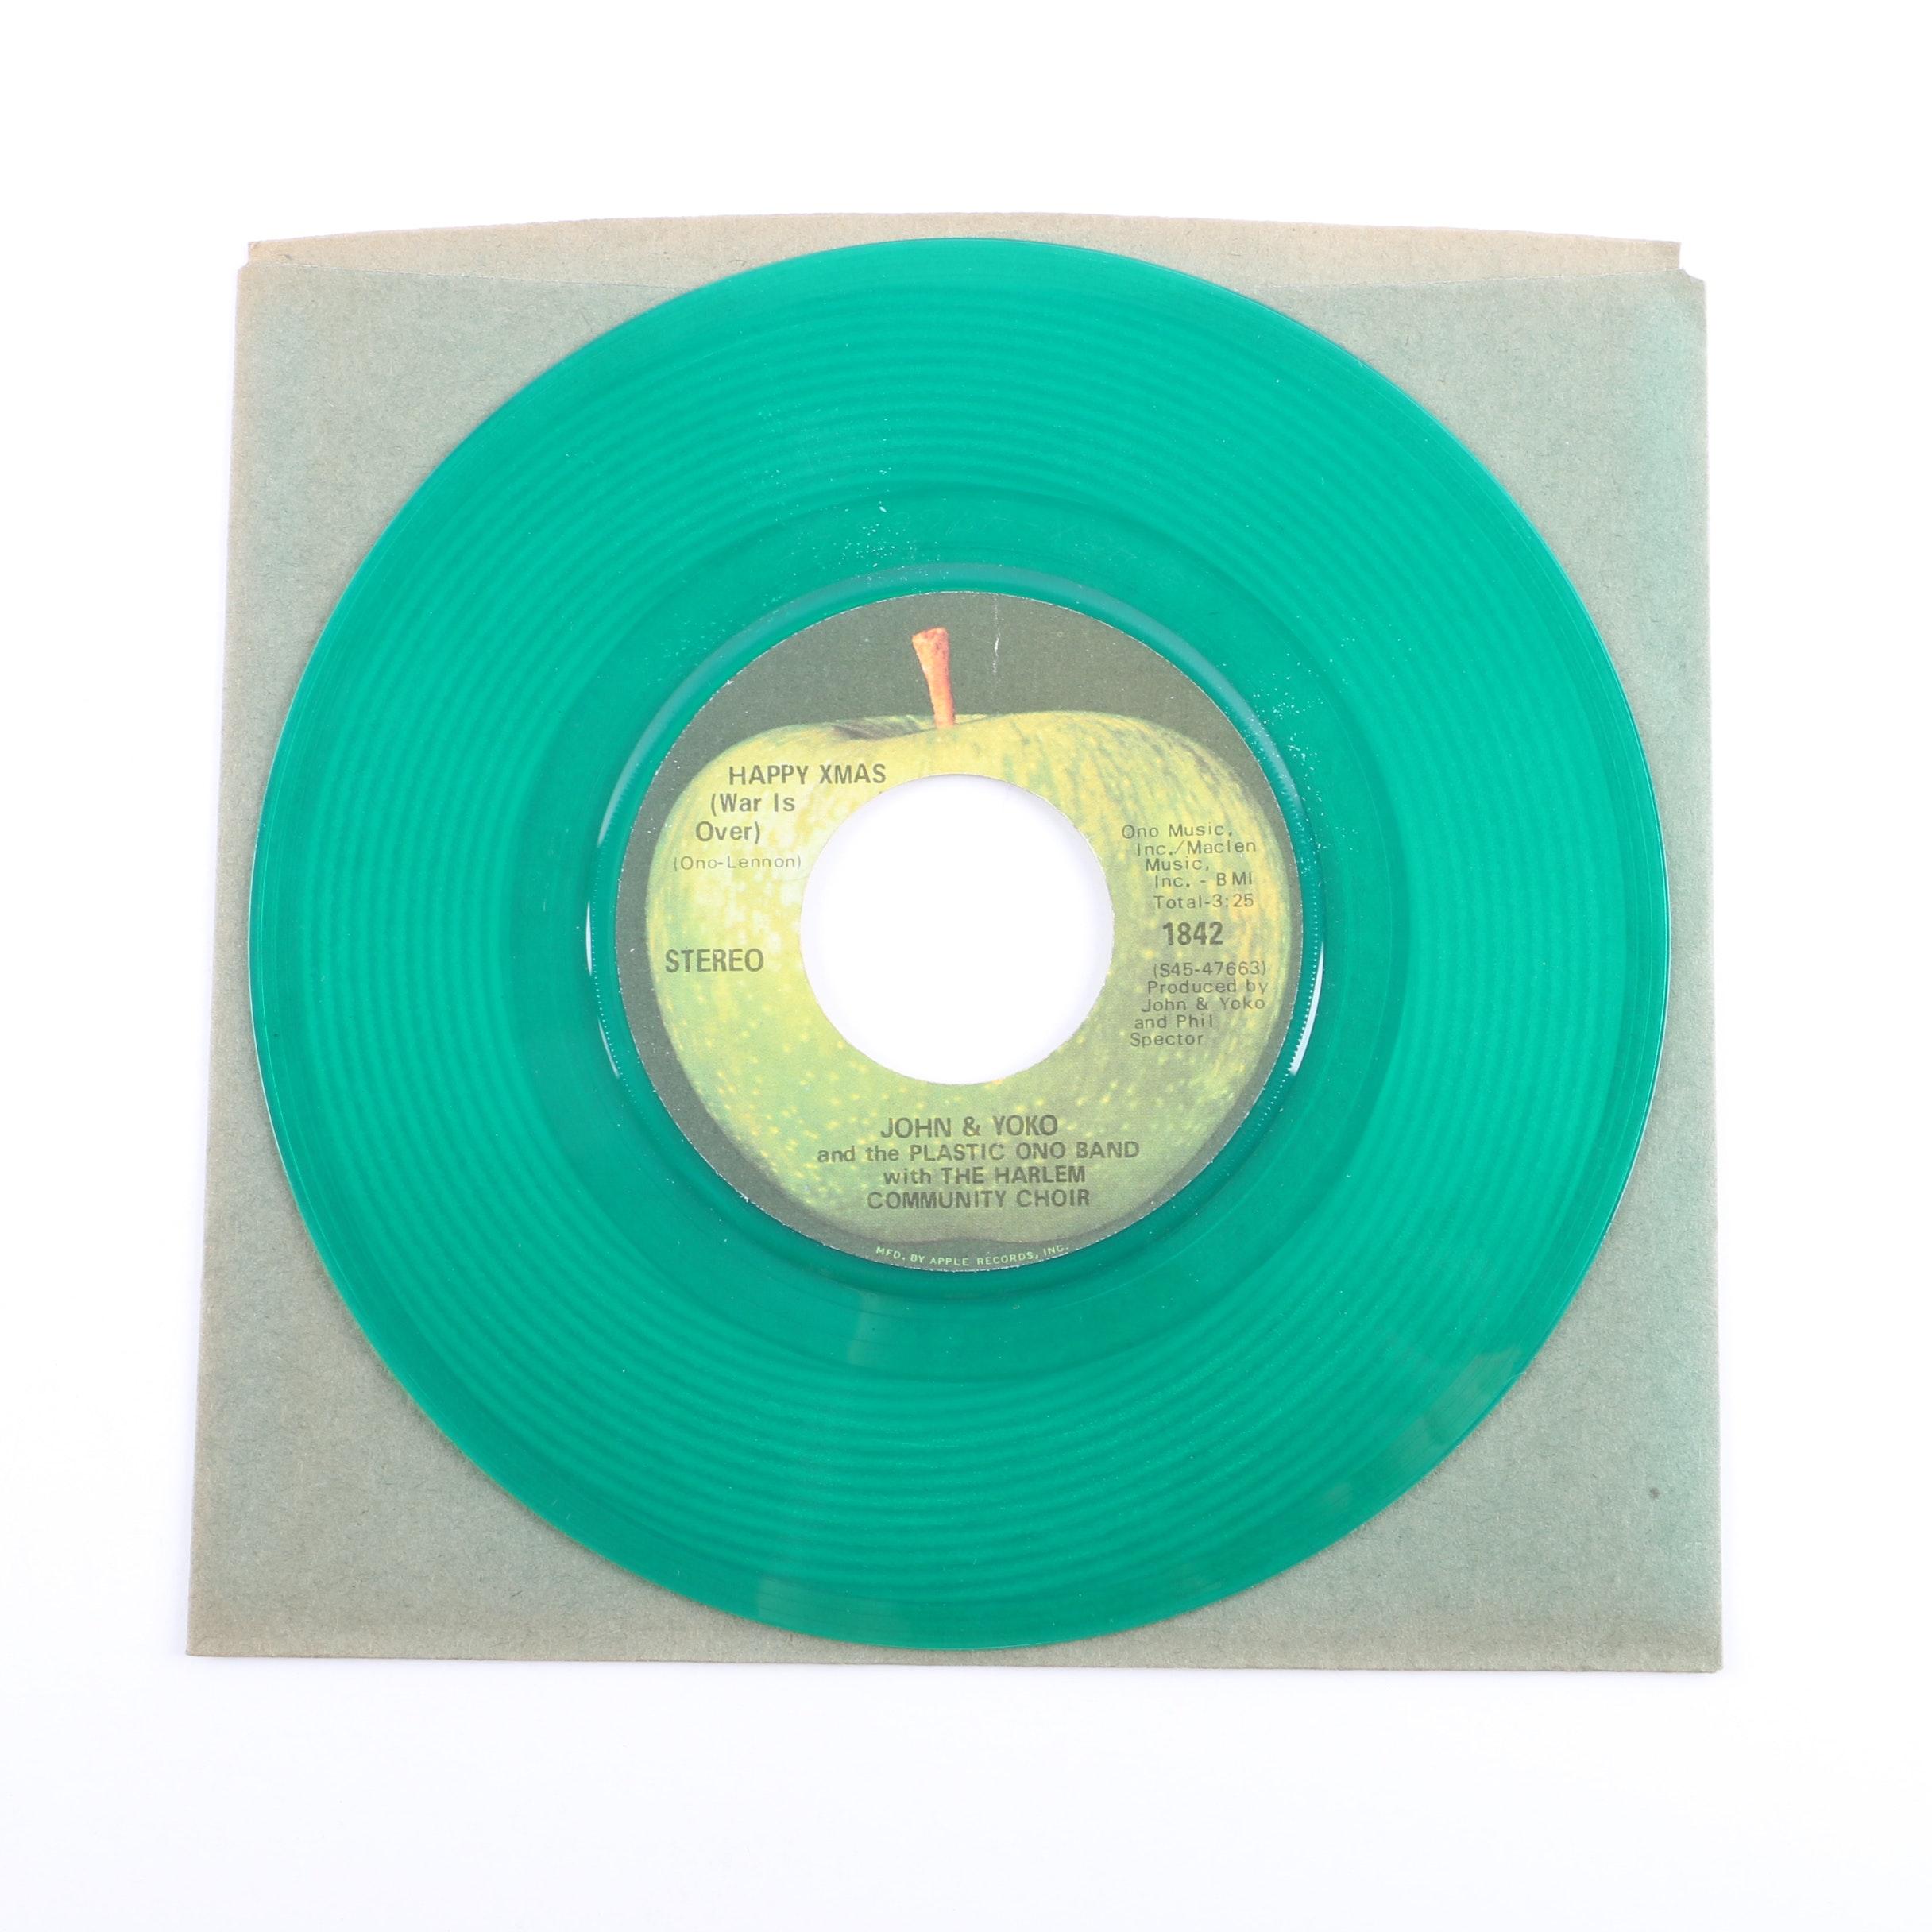 "John & Yoko / Plastic Ono Band ""Happy Xmas (War Is Over) 45 on Colored Vinyl"